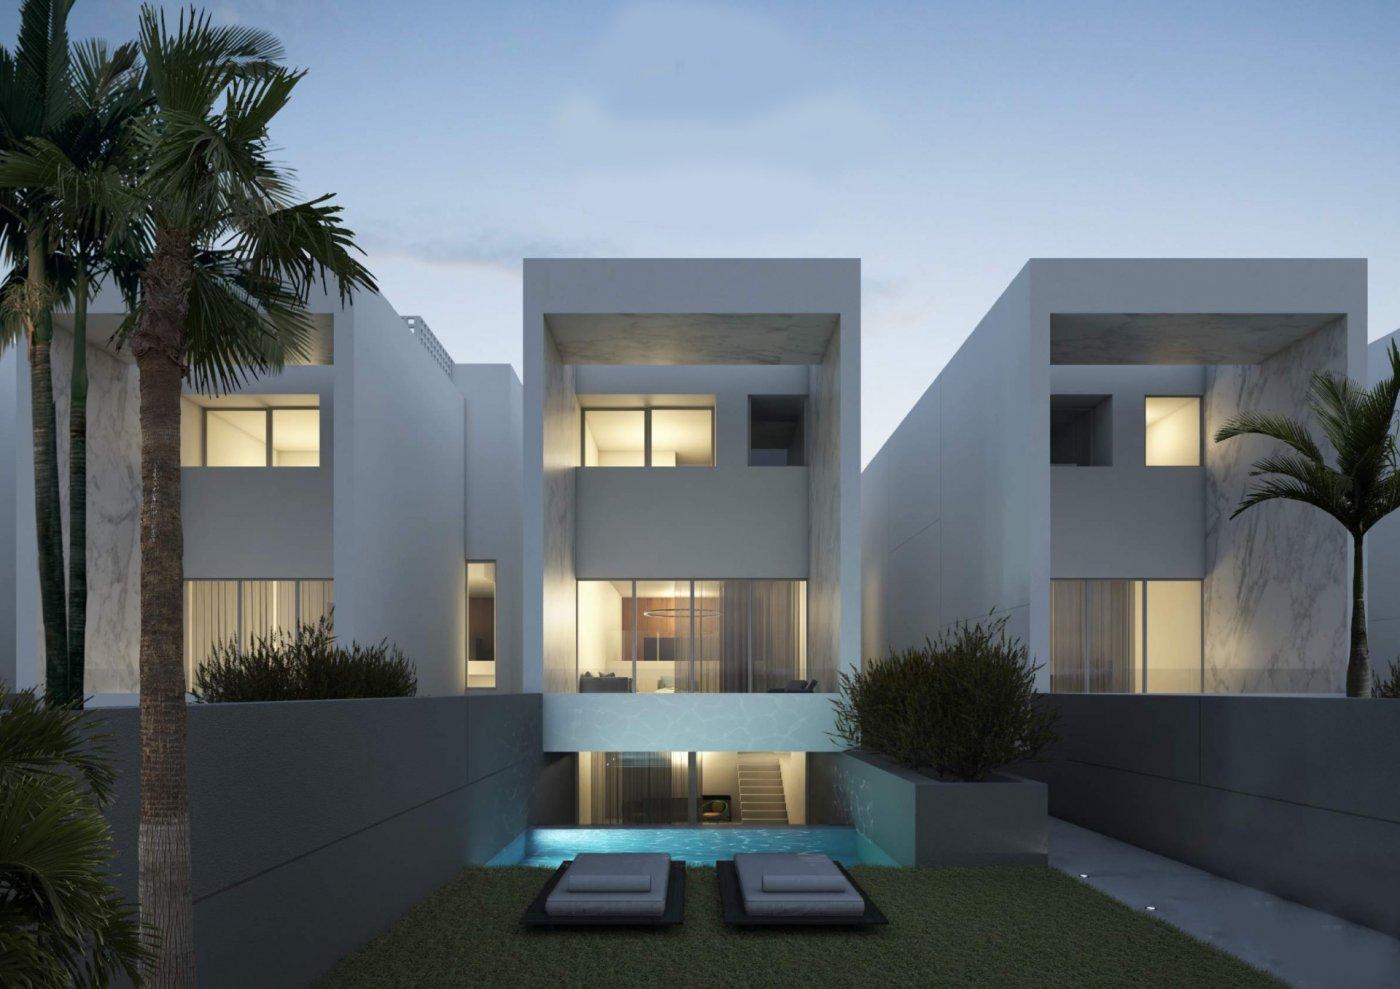 Real Estate Agents Altea - Properties for sale in Altea - villa - albir